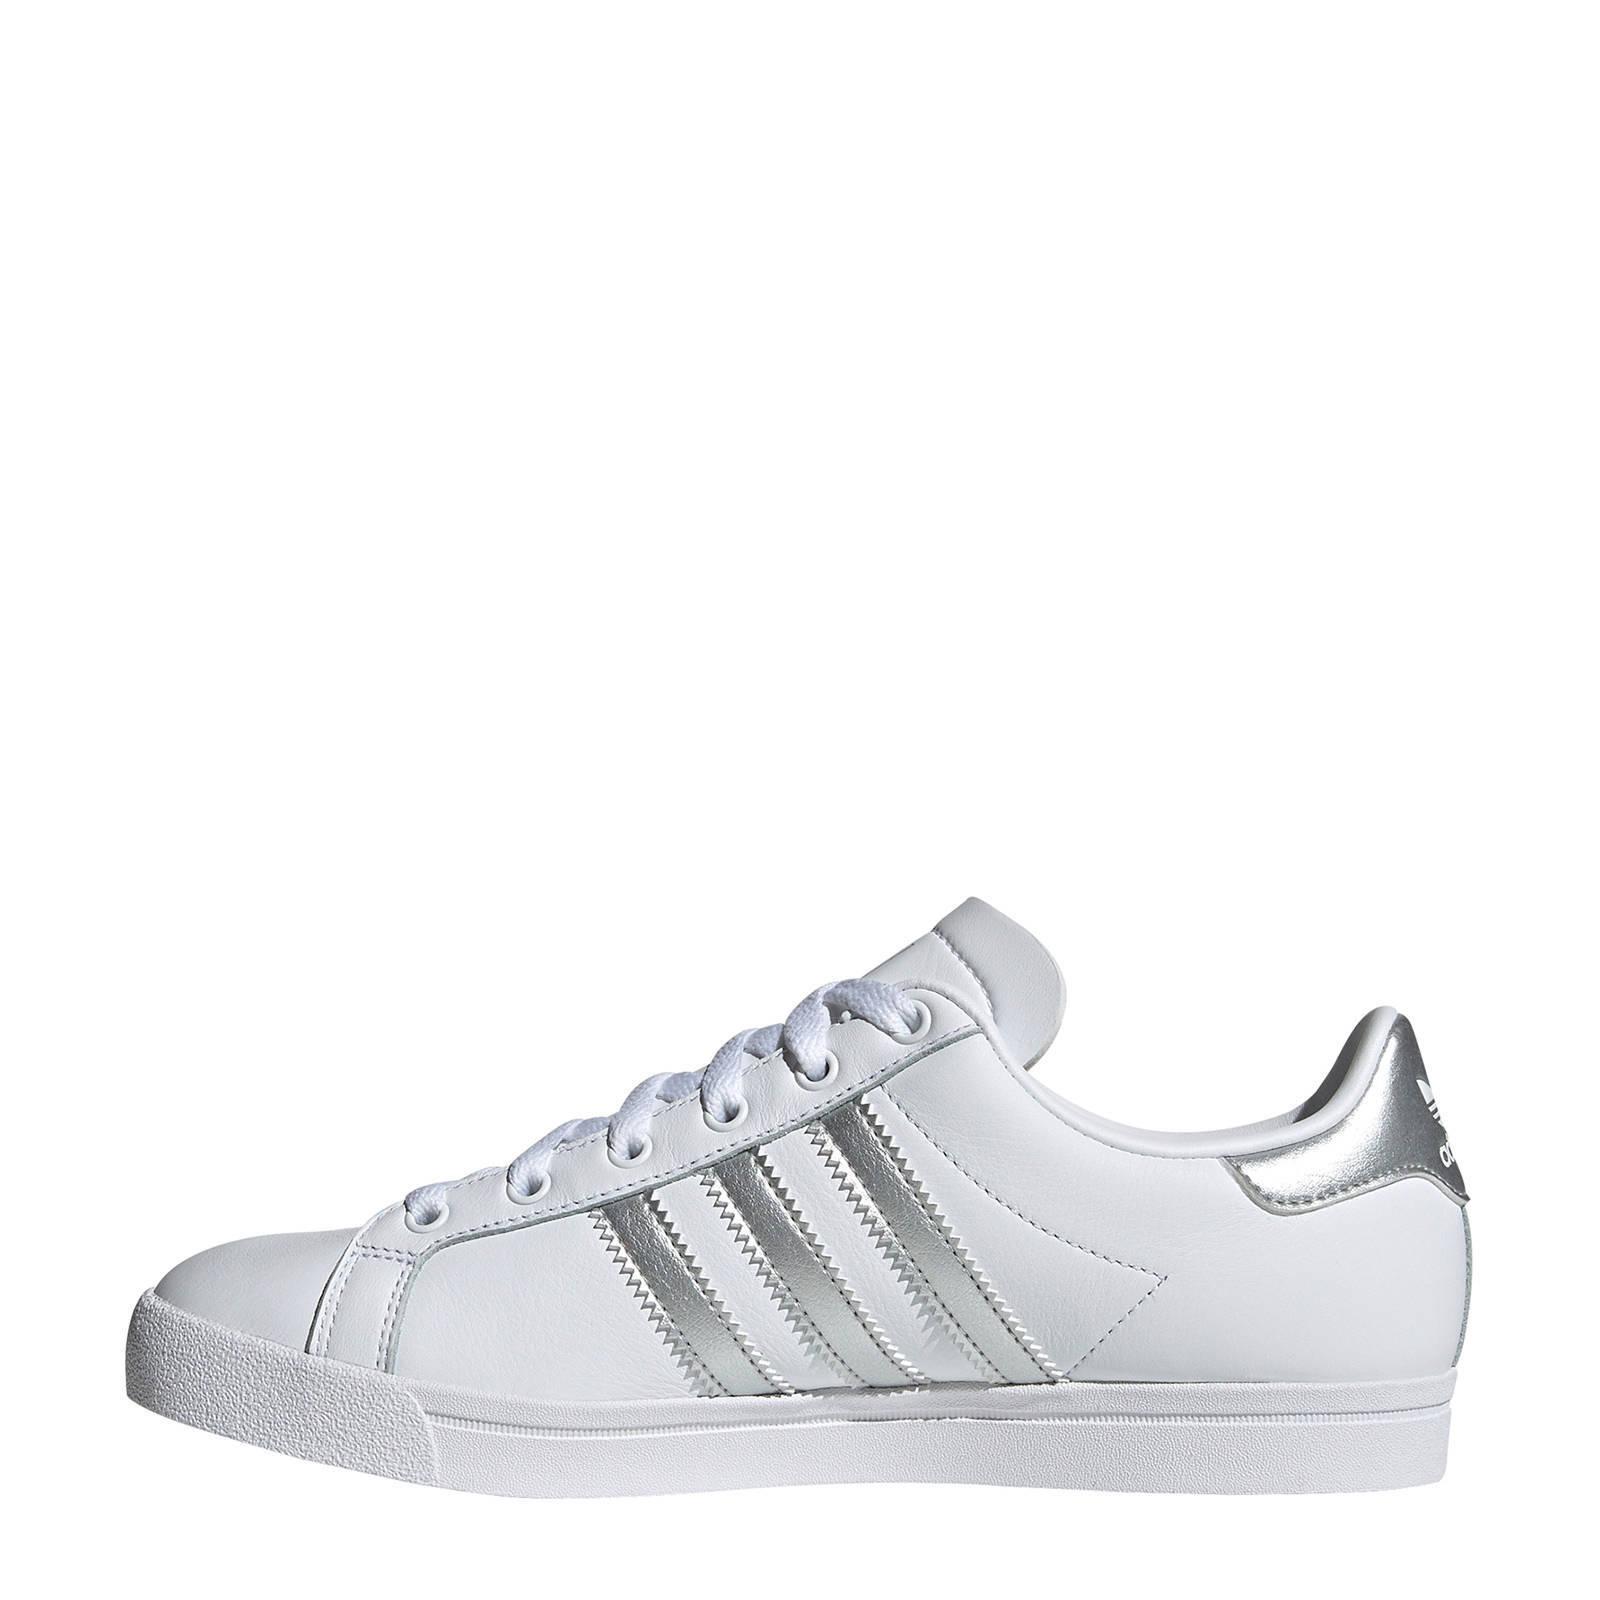 Coast Star J Coast Star W sneakers wit/zilver